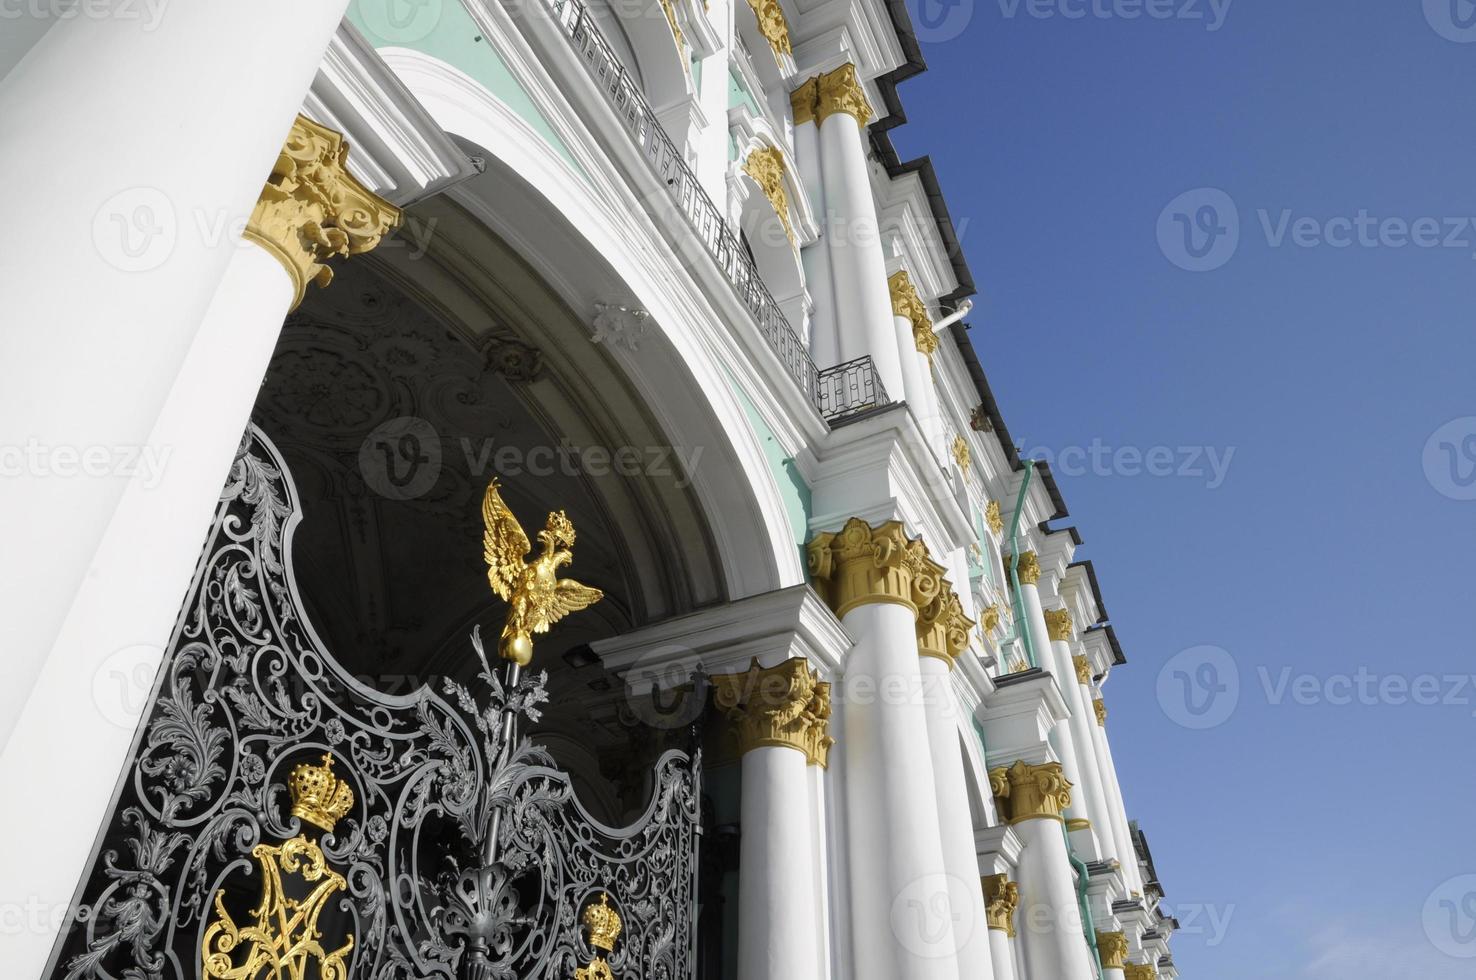 poorten van het winterpaleis in st. petersburg, rusland foto